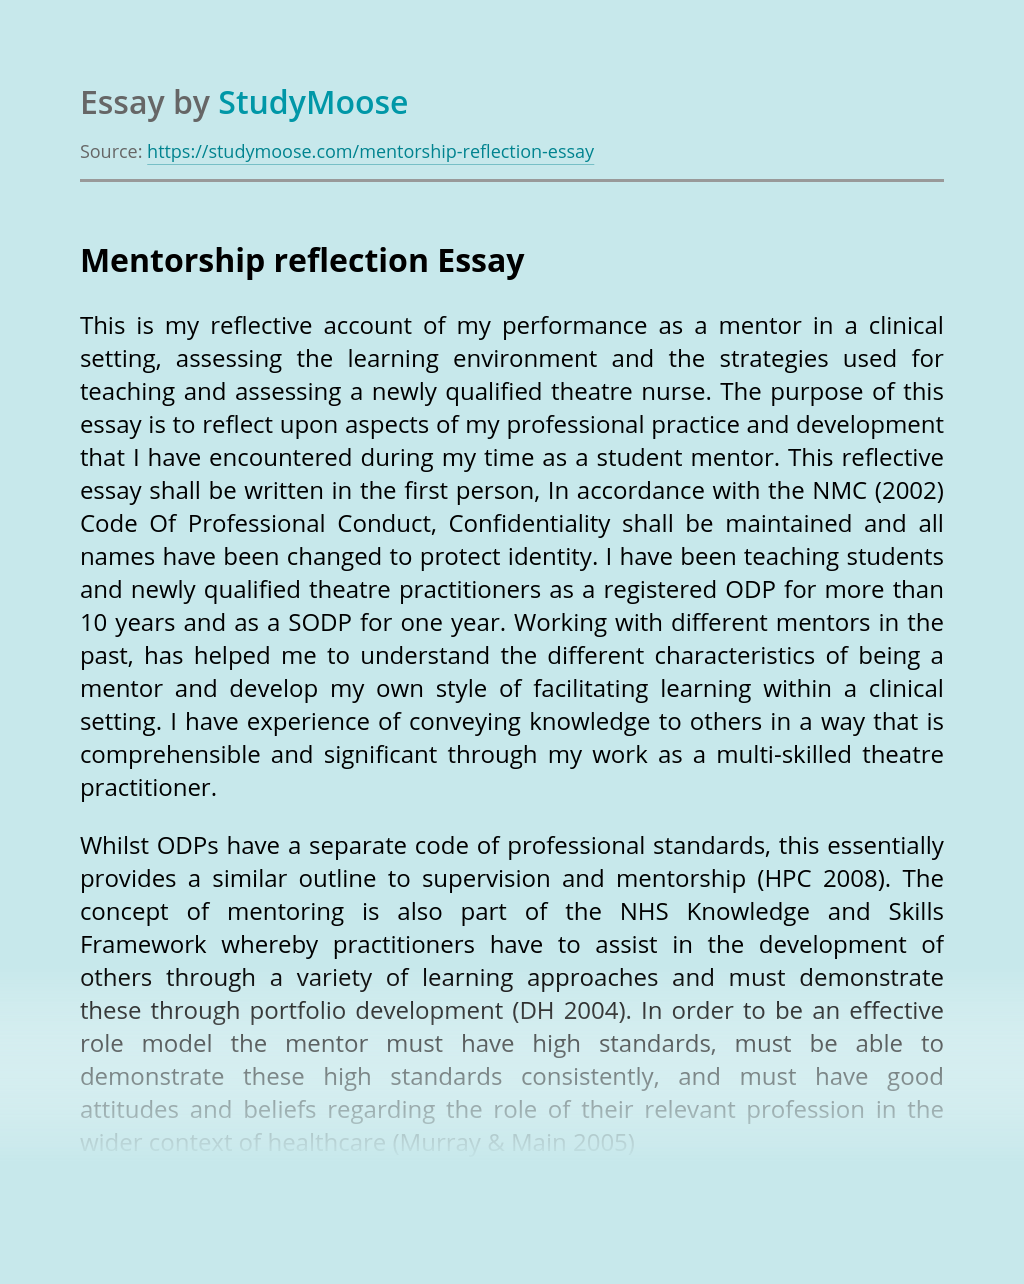 Mentorship reflection